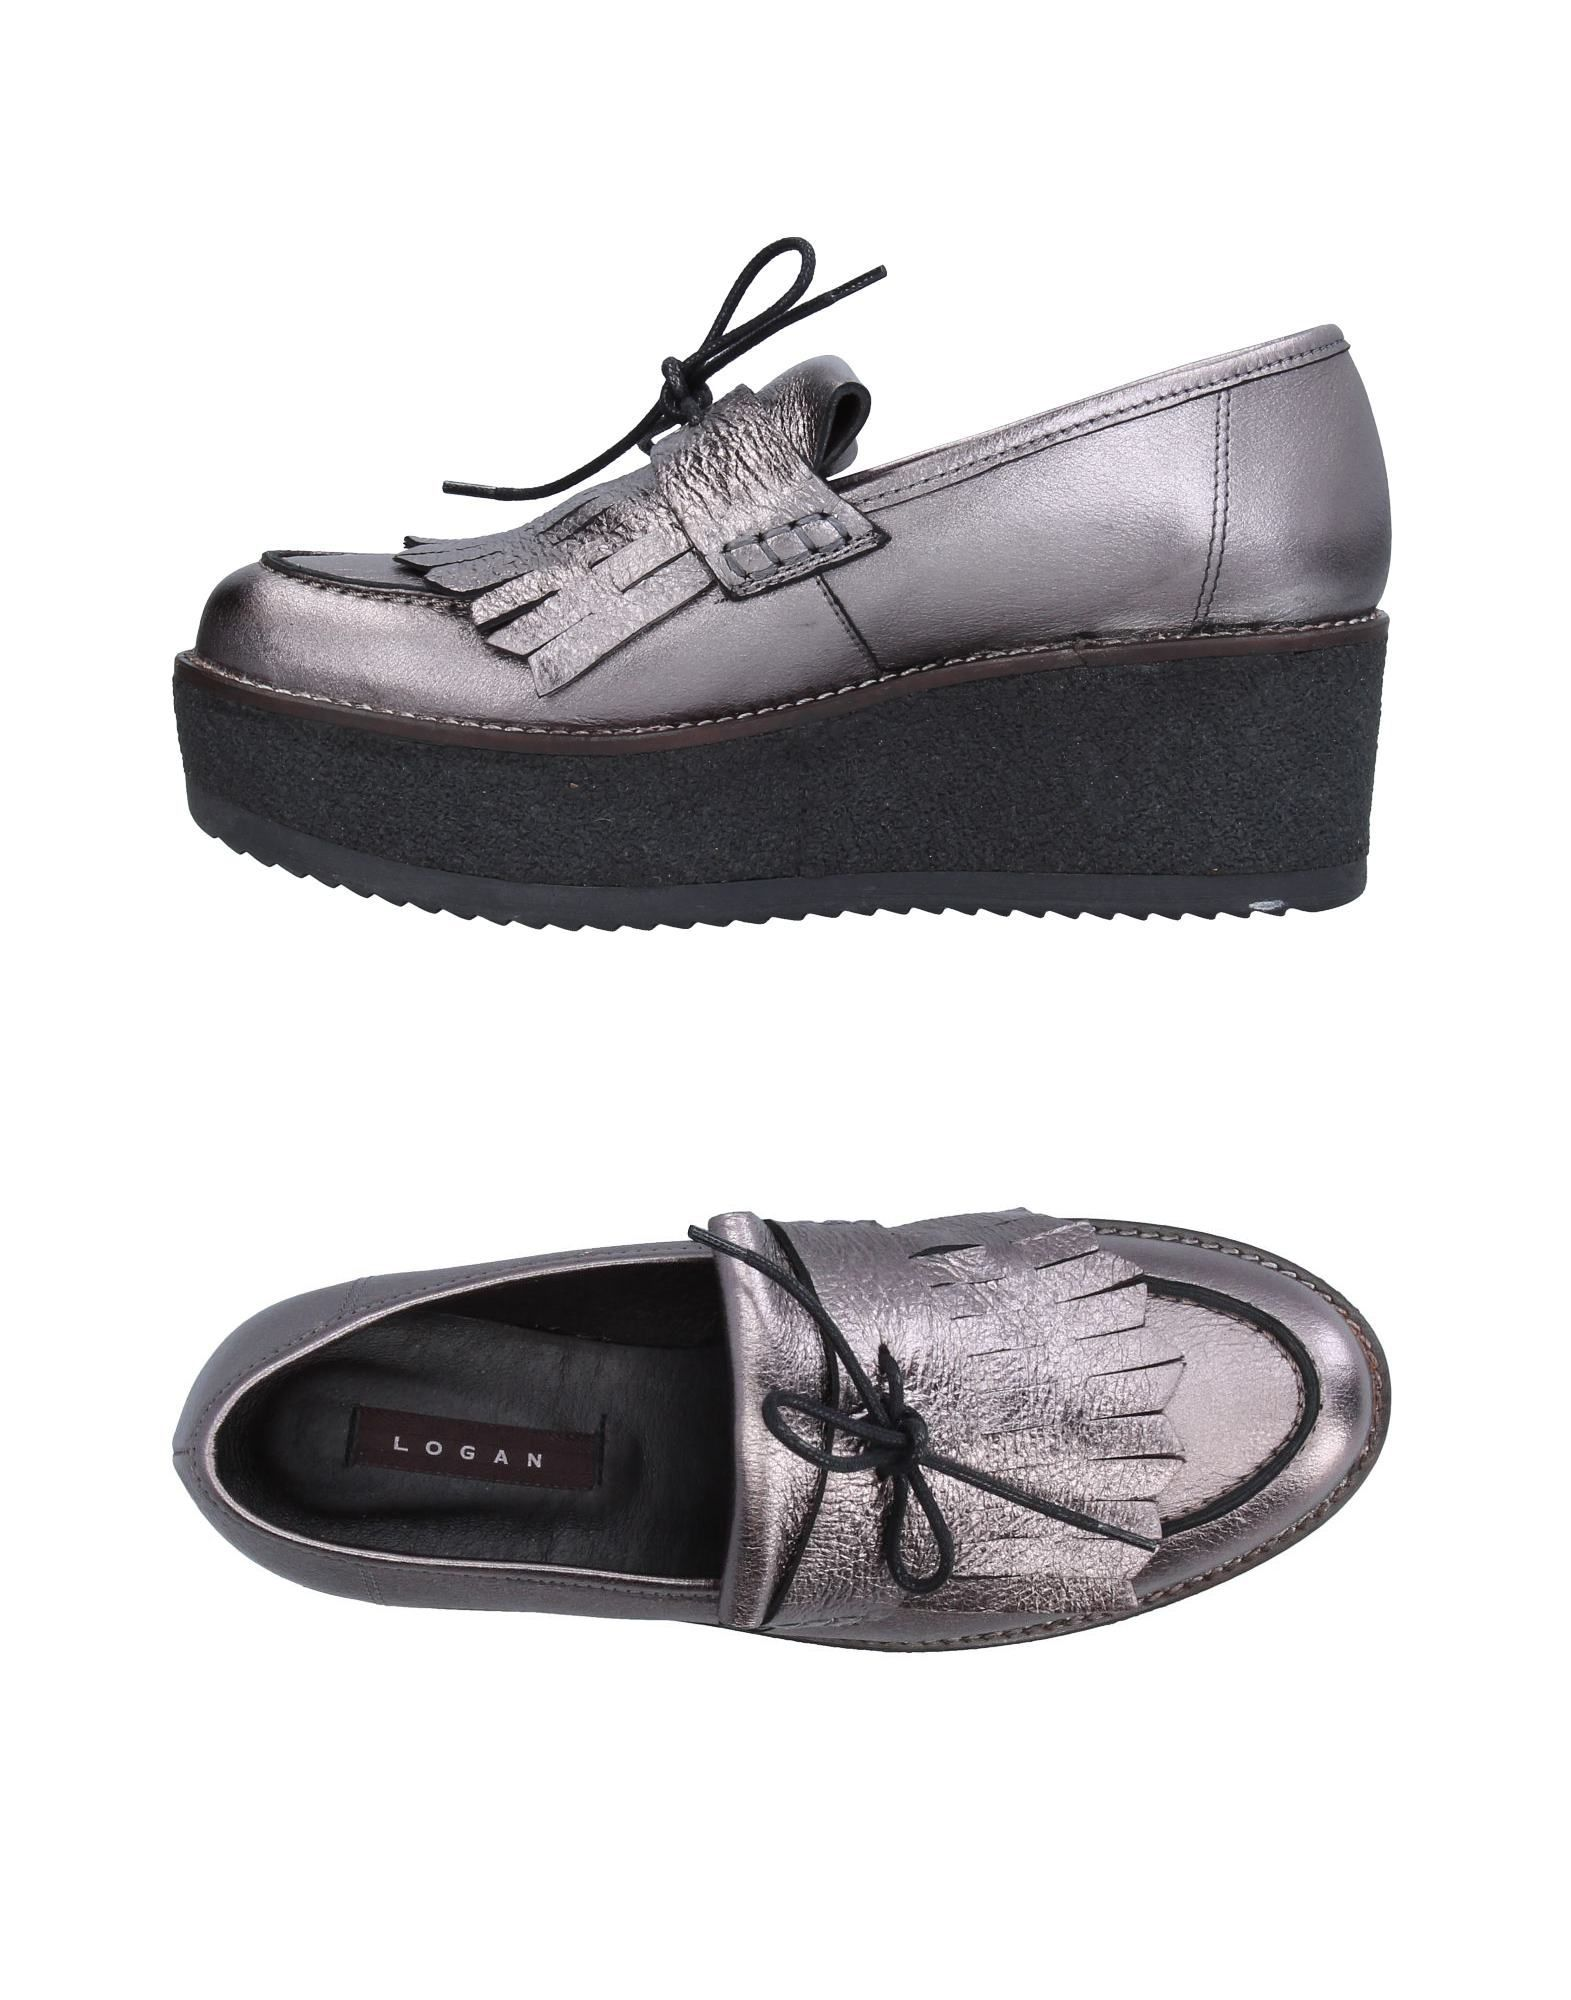 Chaussures Ana Lublin Fashion femme LwDlS